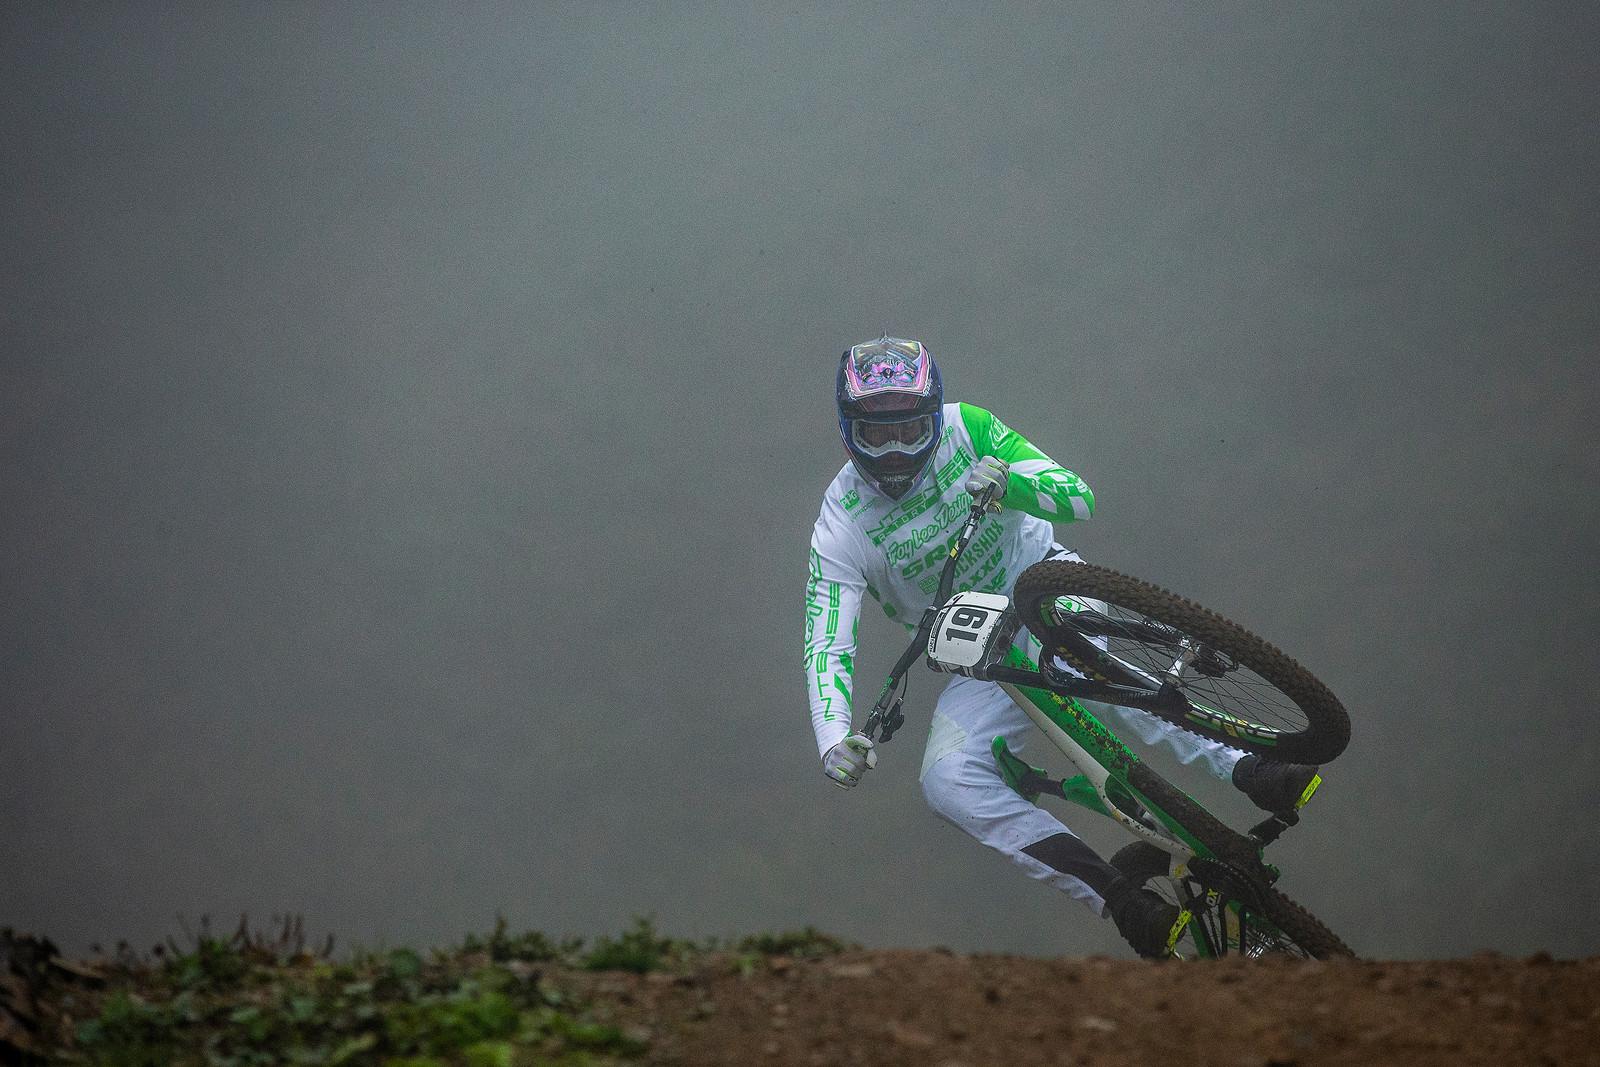 Dean Lucas - WORLD CHAMPS WHIPFEST - Mountain Biking Pictures - Vital MTB